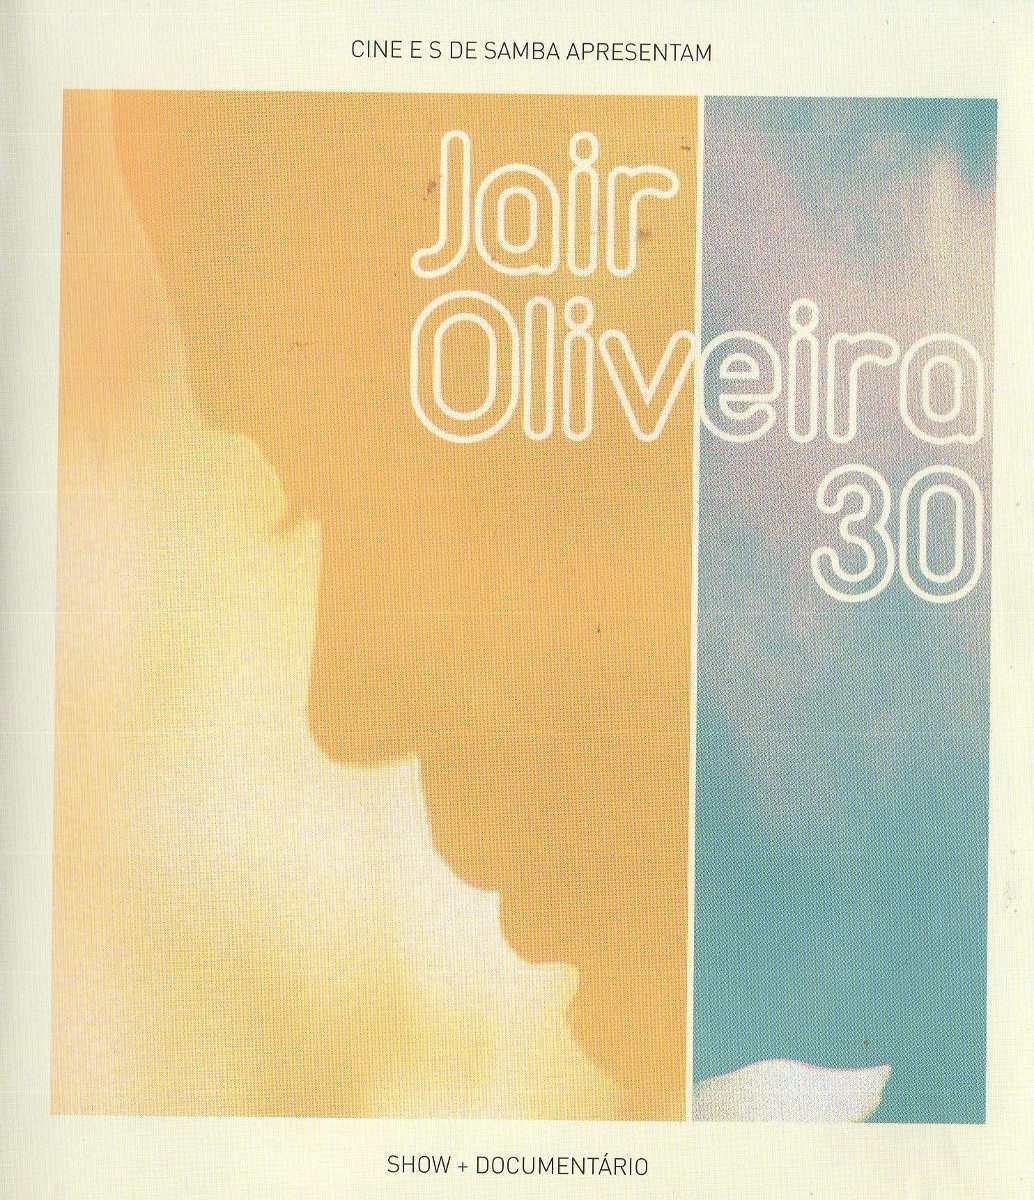 Jair Oliveira 30